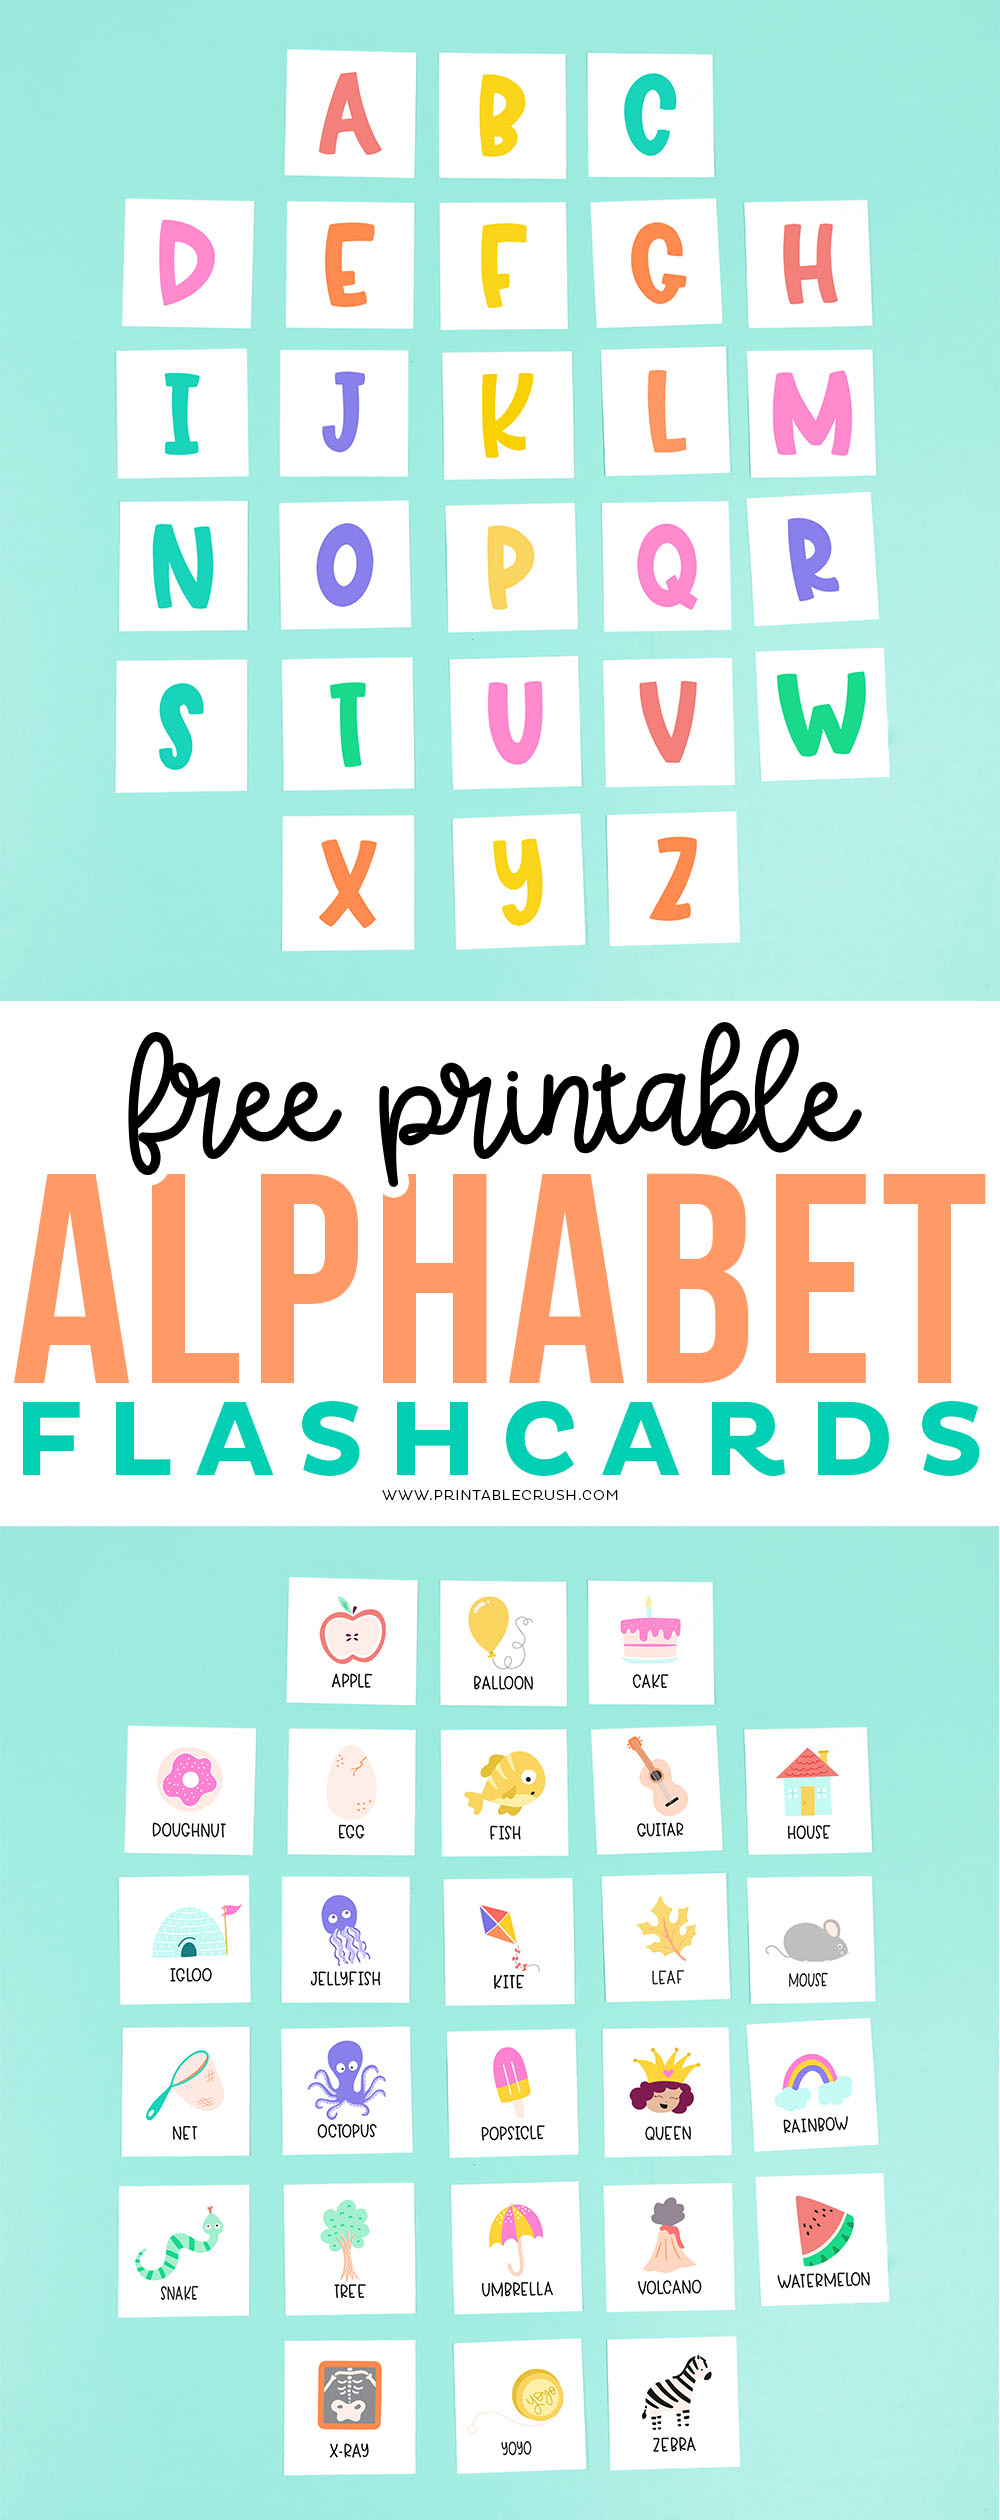 Free Printable Alphabet Flashcards - Printable Crush